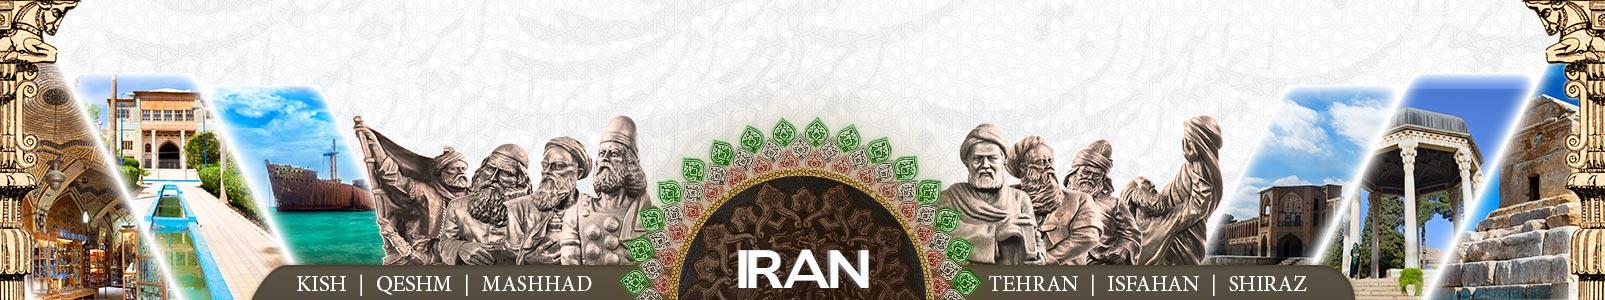 بنر-تور-ایران-شیراز-مشهد-قشم-کیش-تبریز